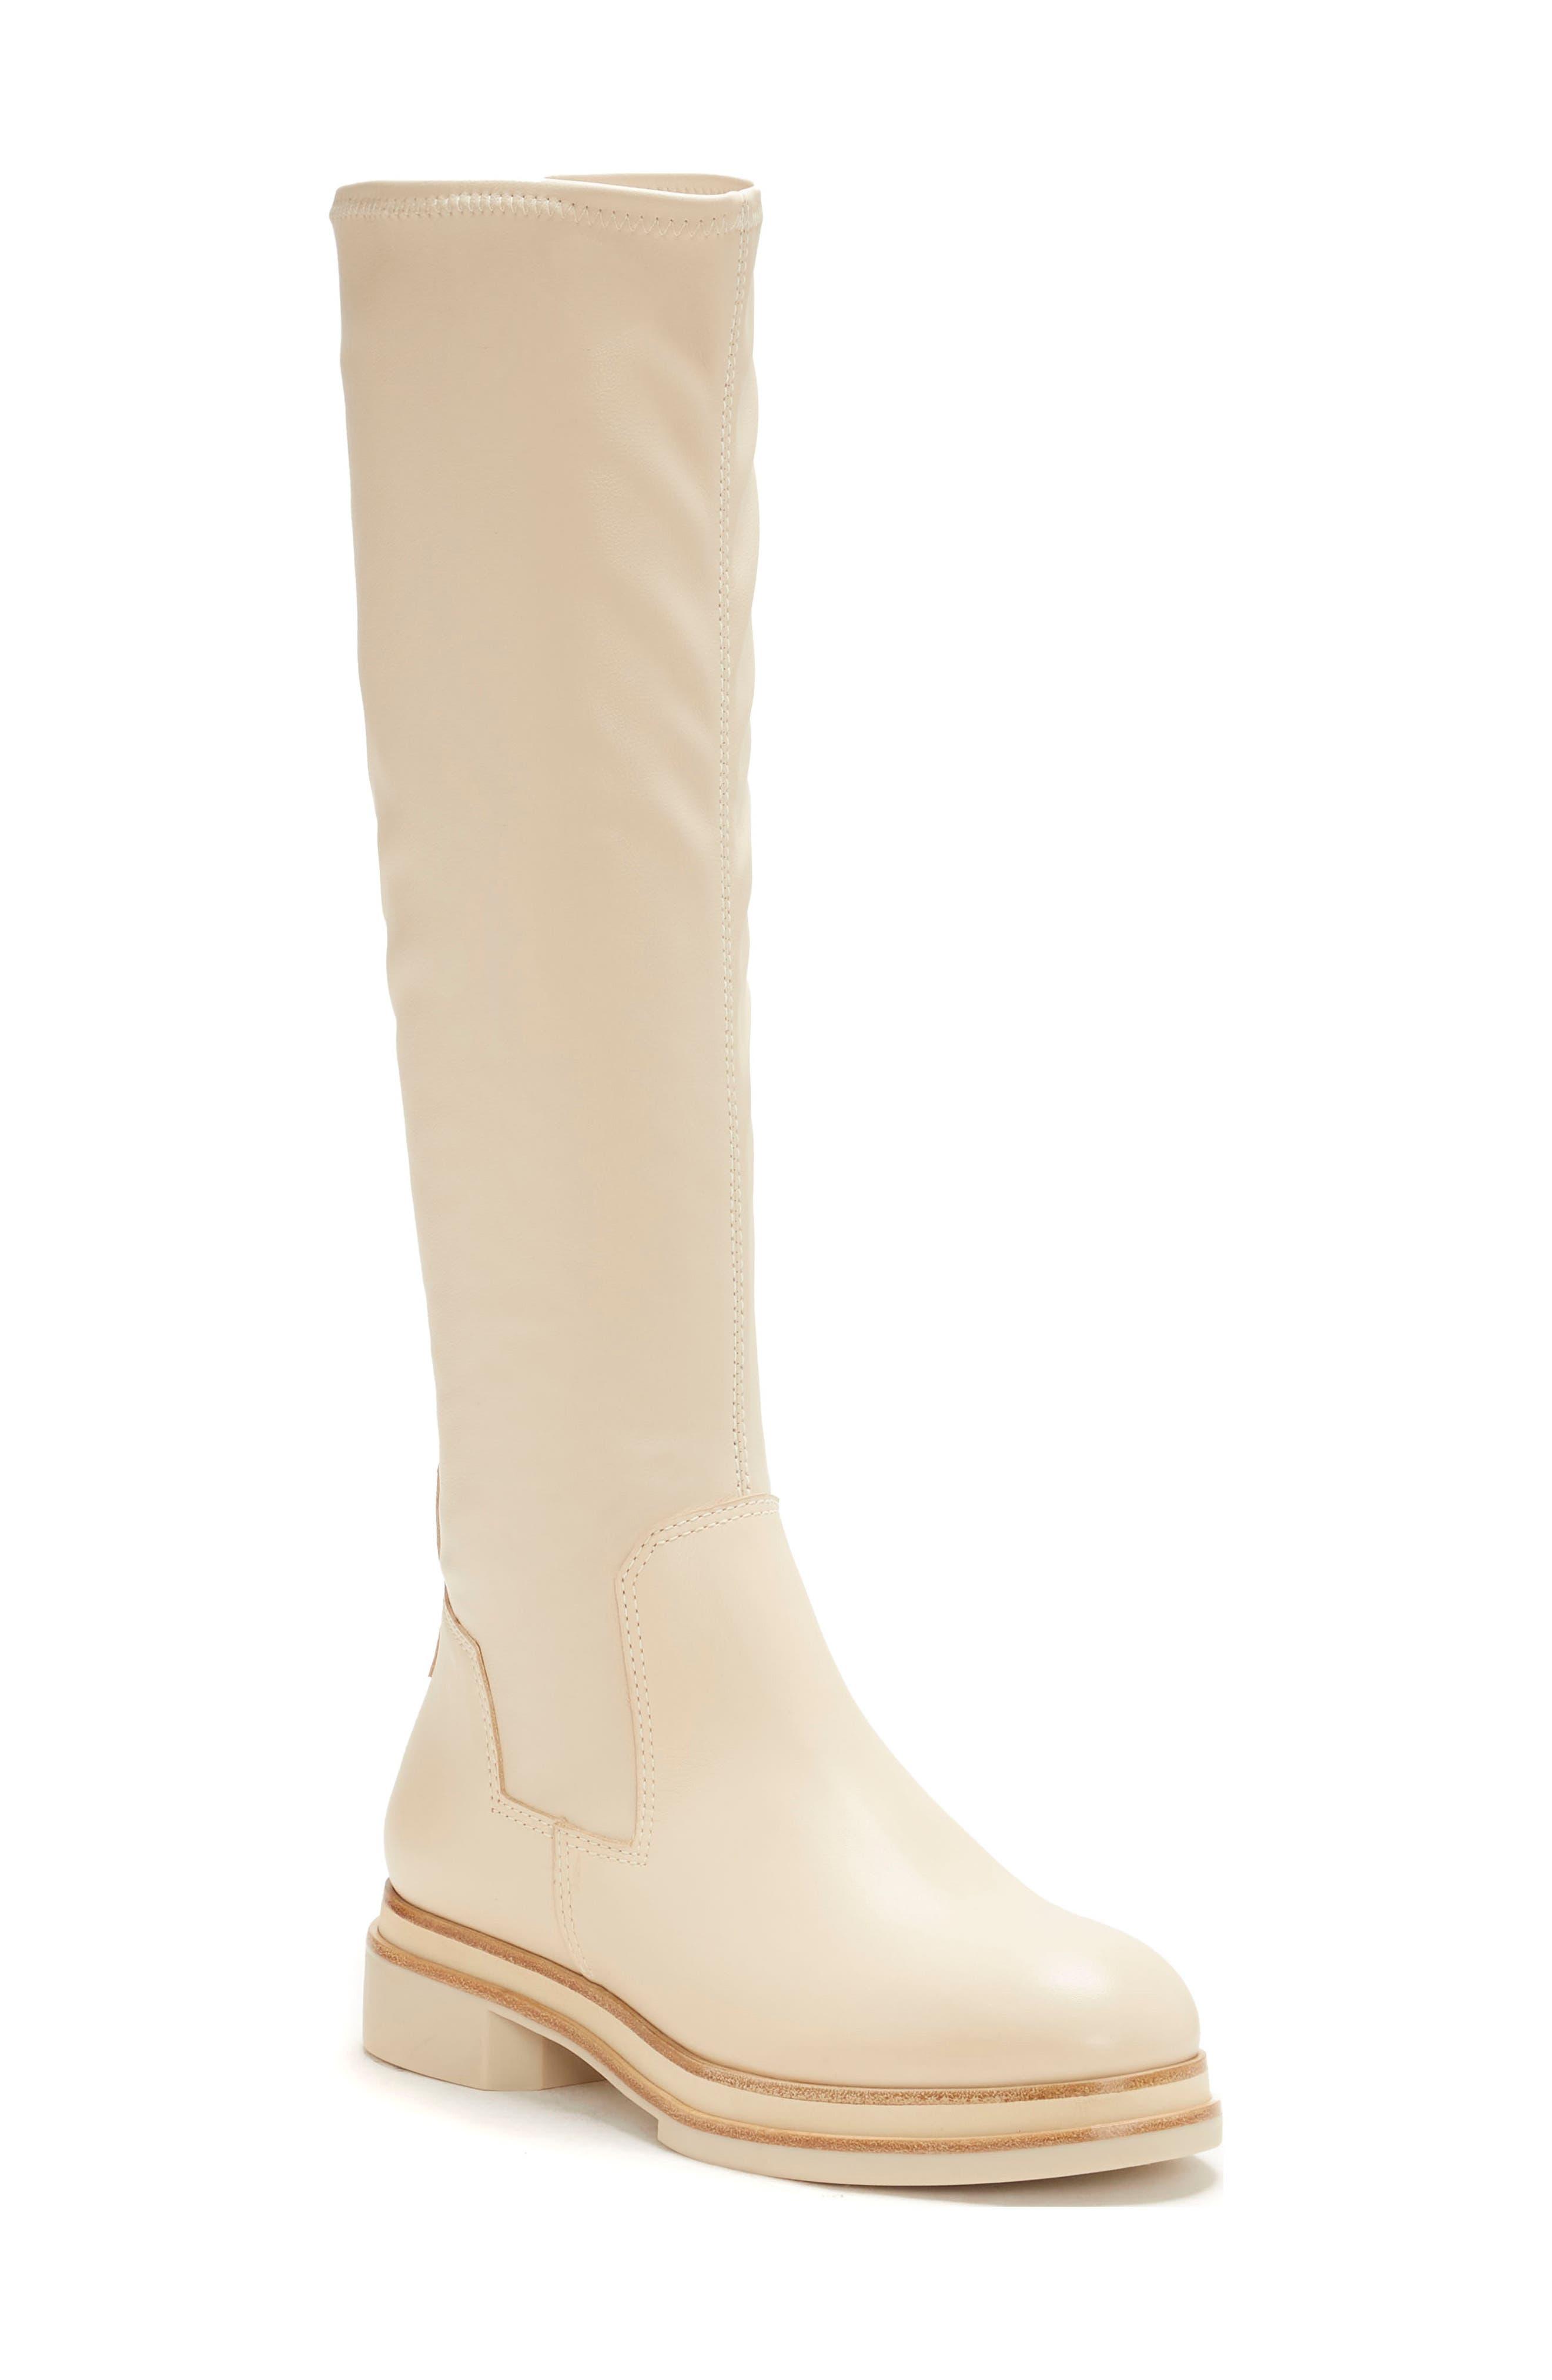 Tiley Boot